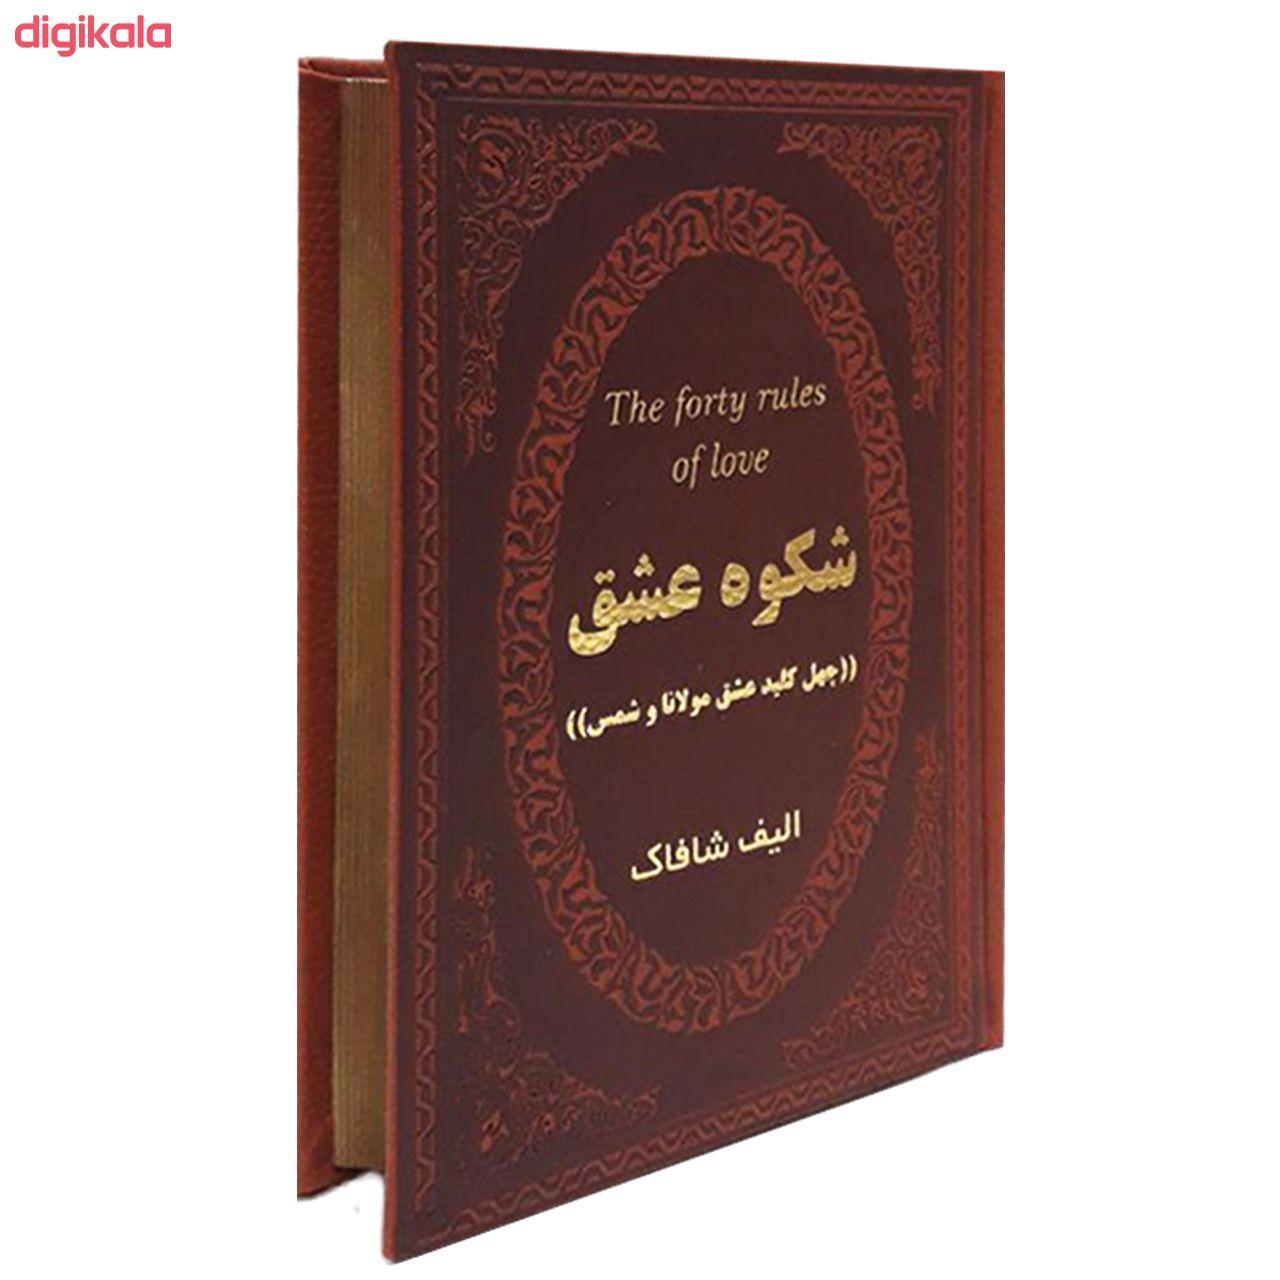 کتاب شکوه عشق اثر الیف شافاک انتشارات پارمیس main 1 2